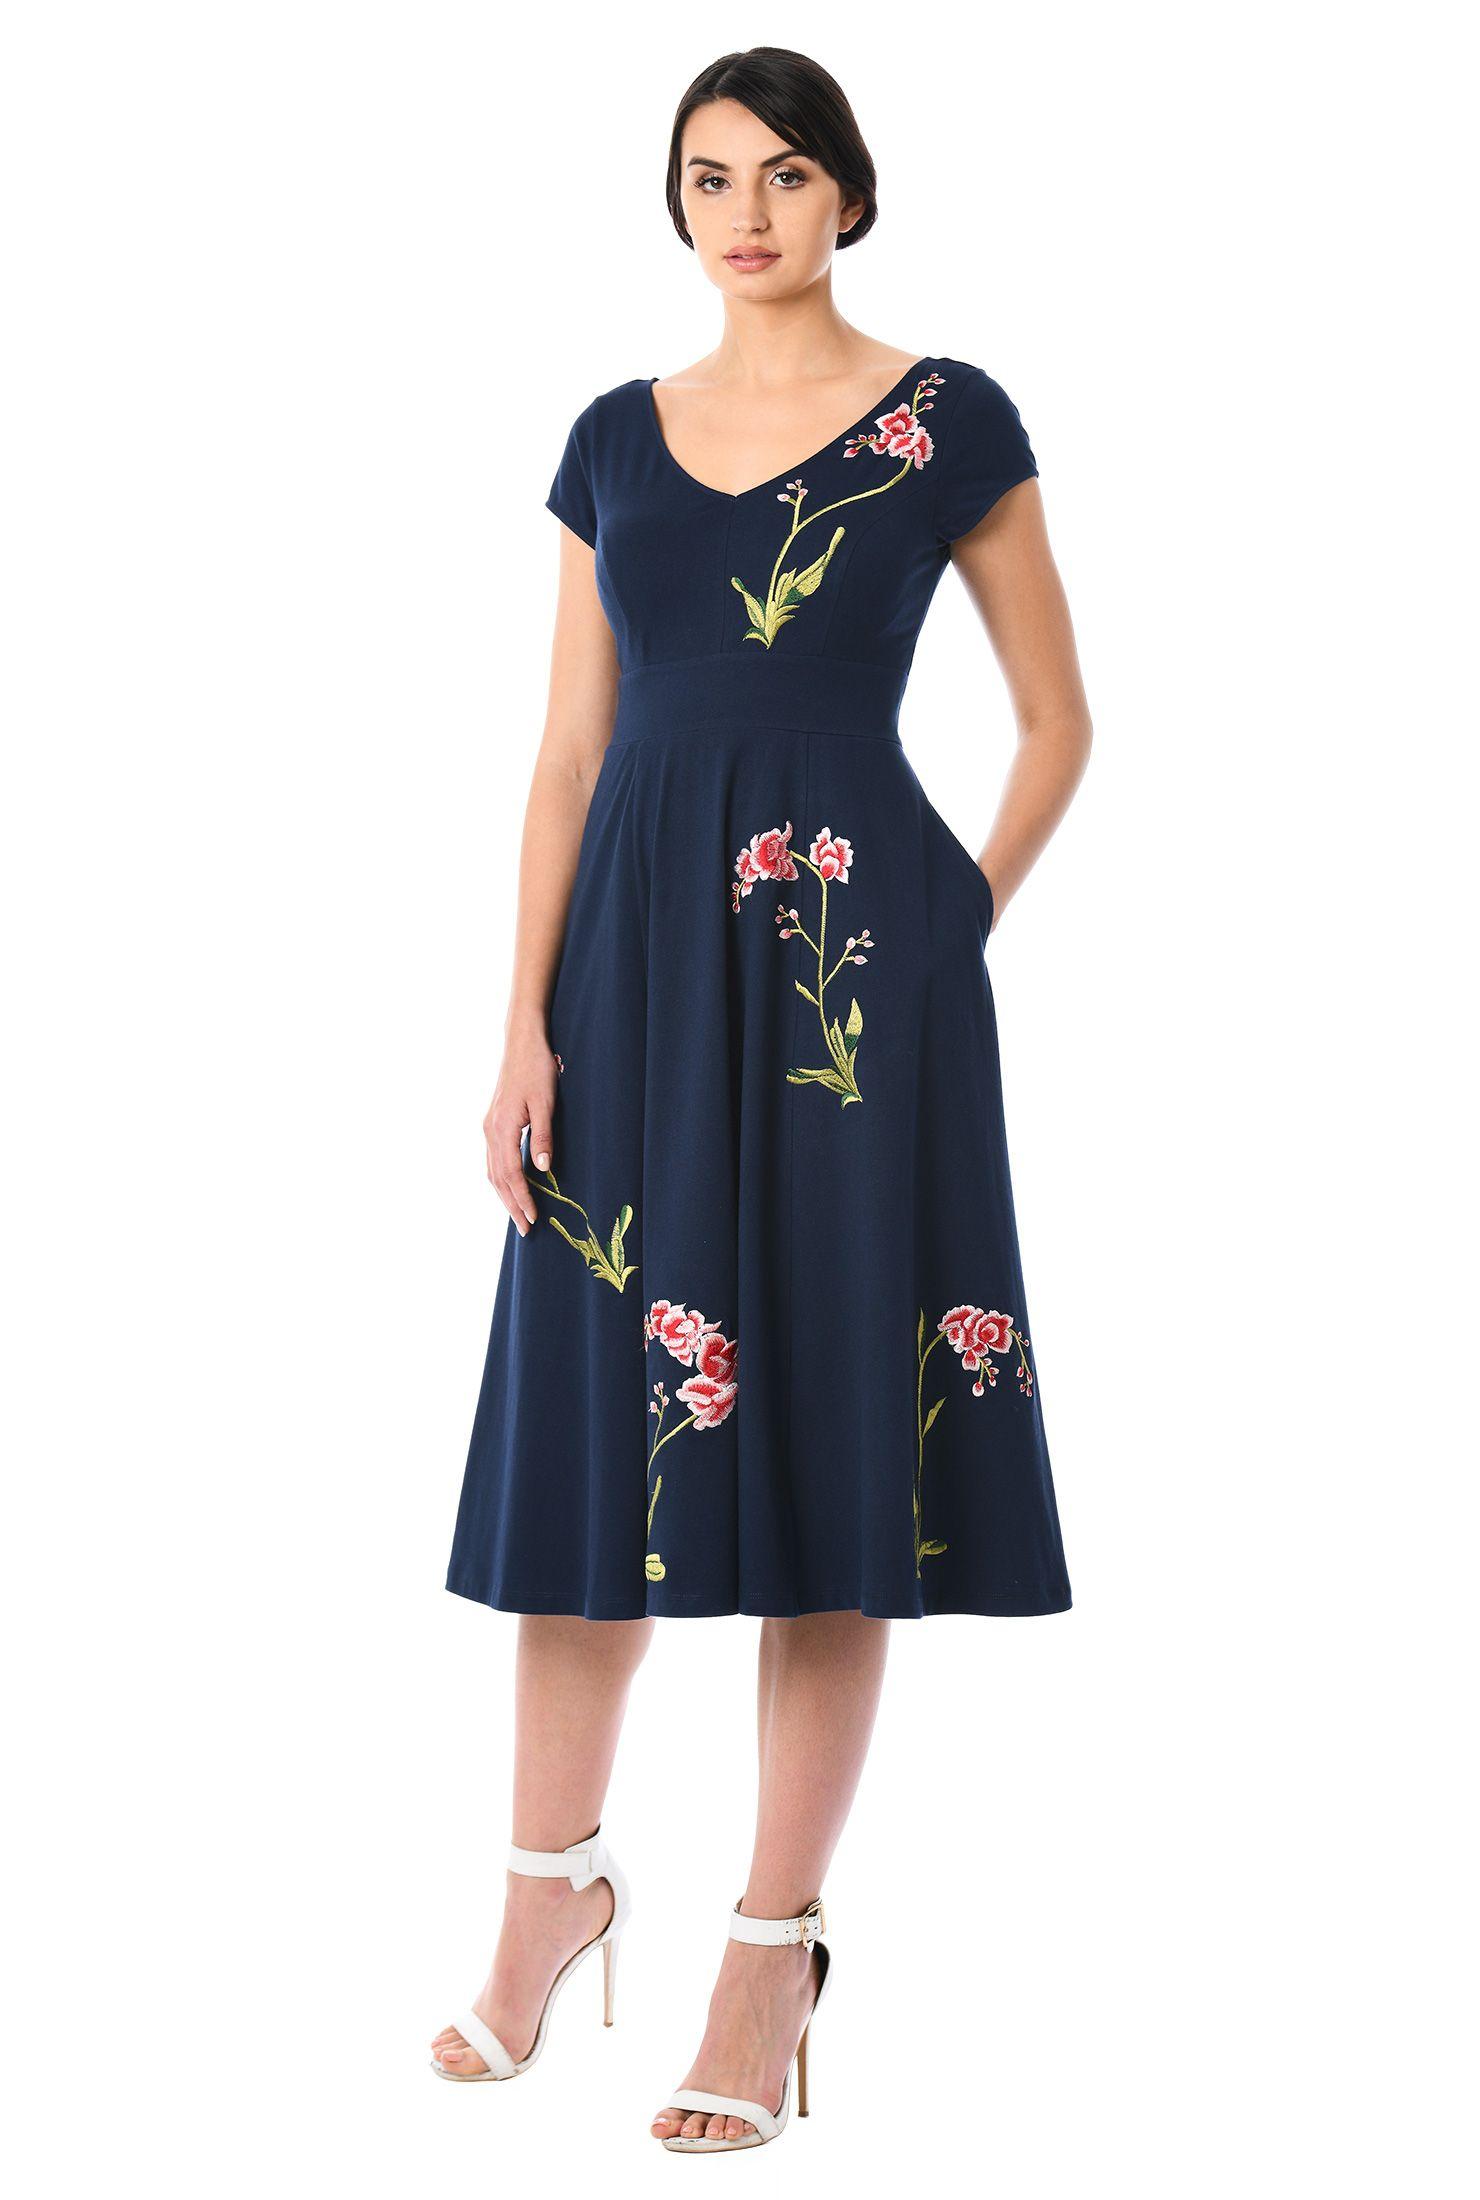 cap sleeve dresses, cotton/spandex Dresses, day dresses, Deep Navy ...